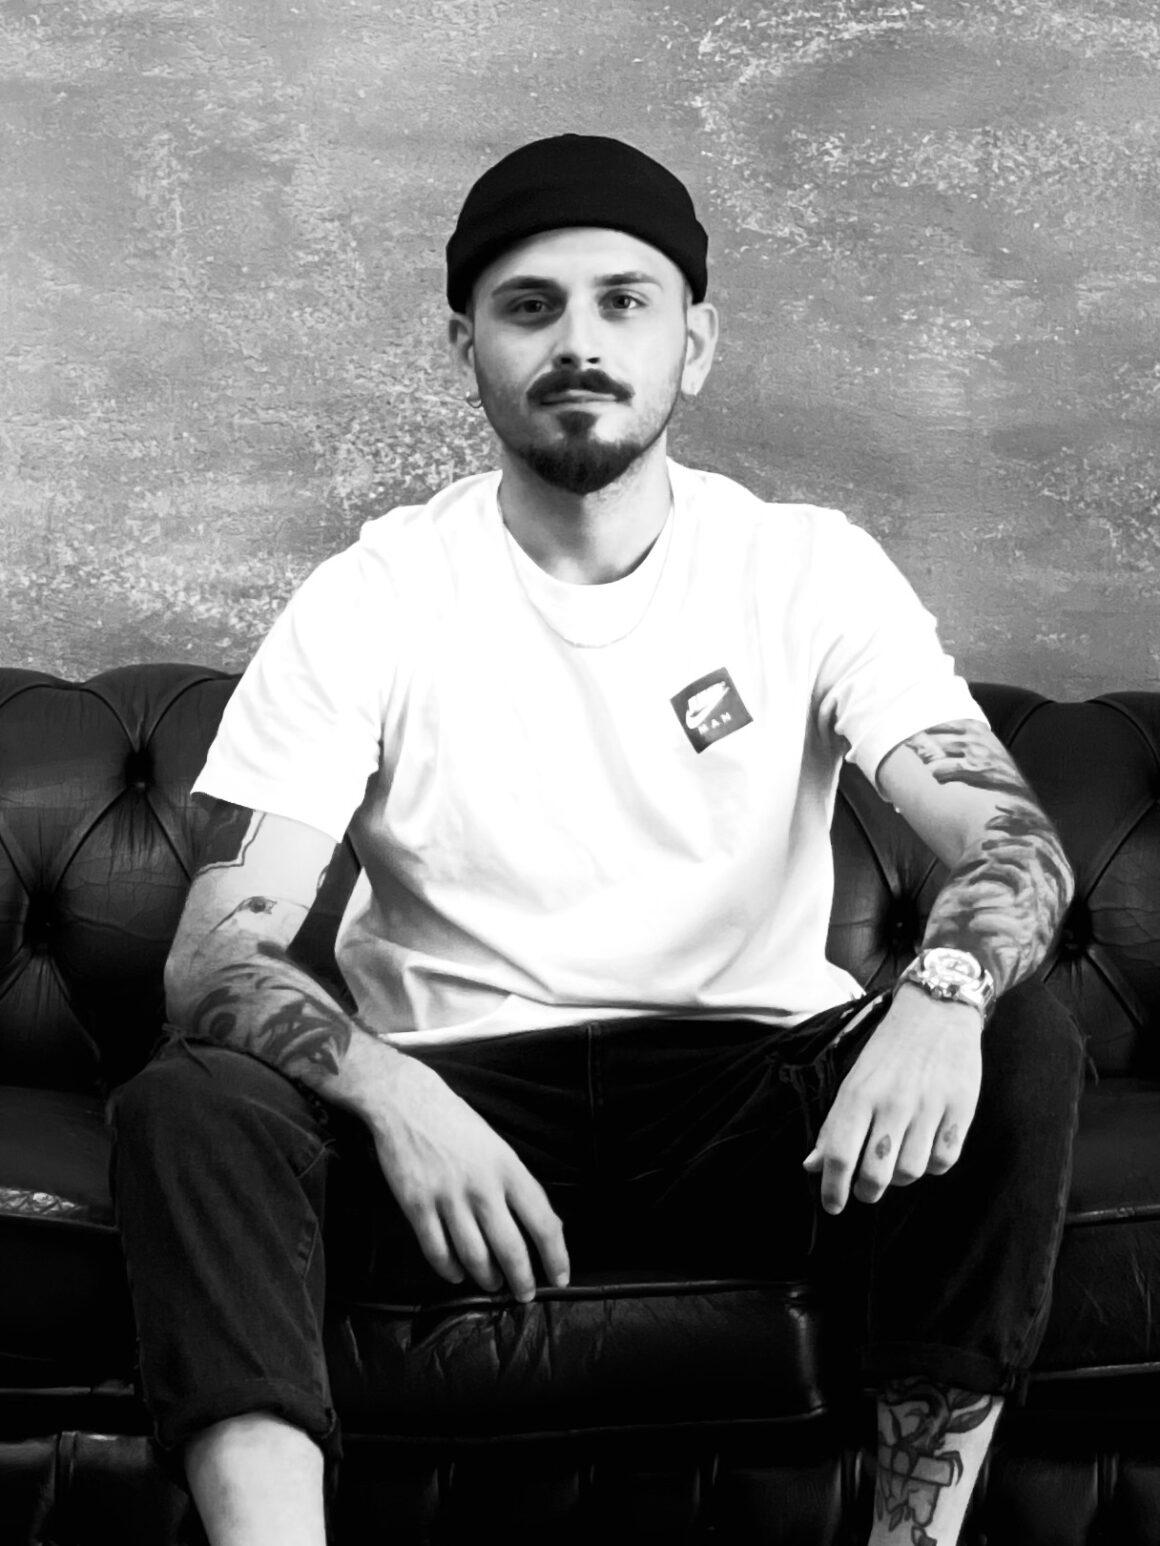 Diego De Sintas, Family Addiction Tattoo Shop, Giugliano In Campania